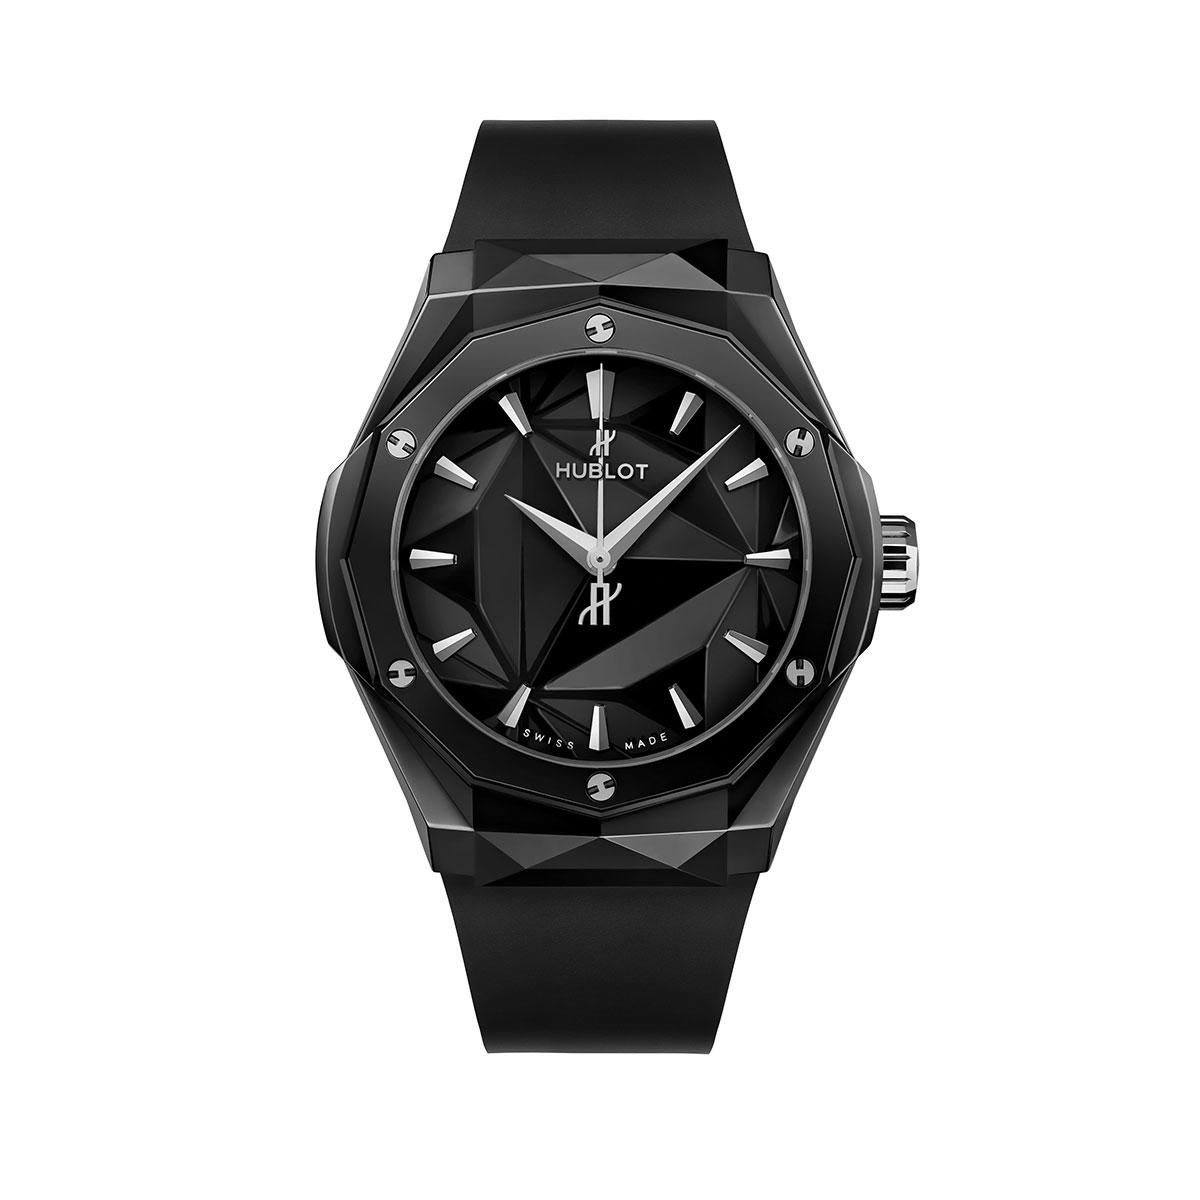 Hublot Classic Fusion Orlinkski Black Magic 40mm Watch